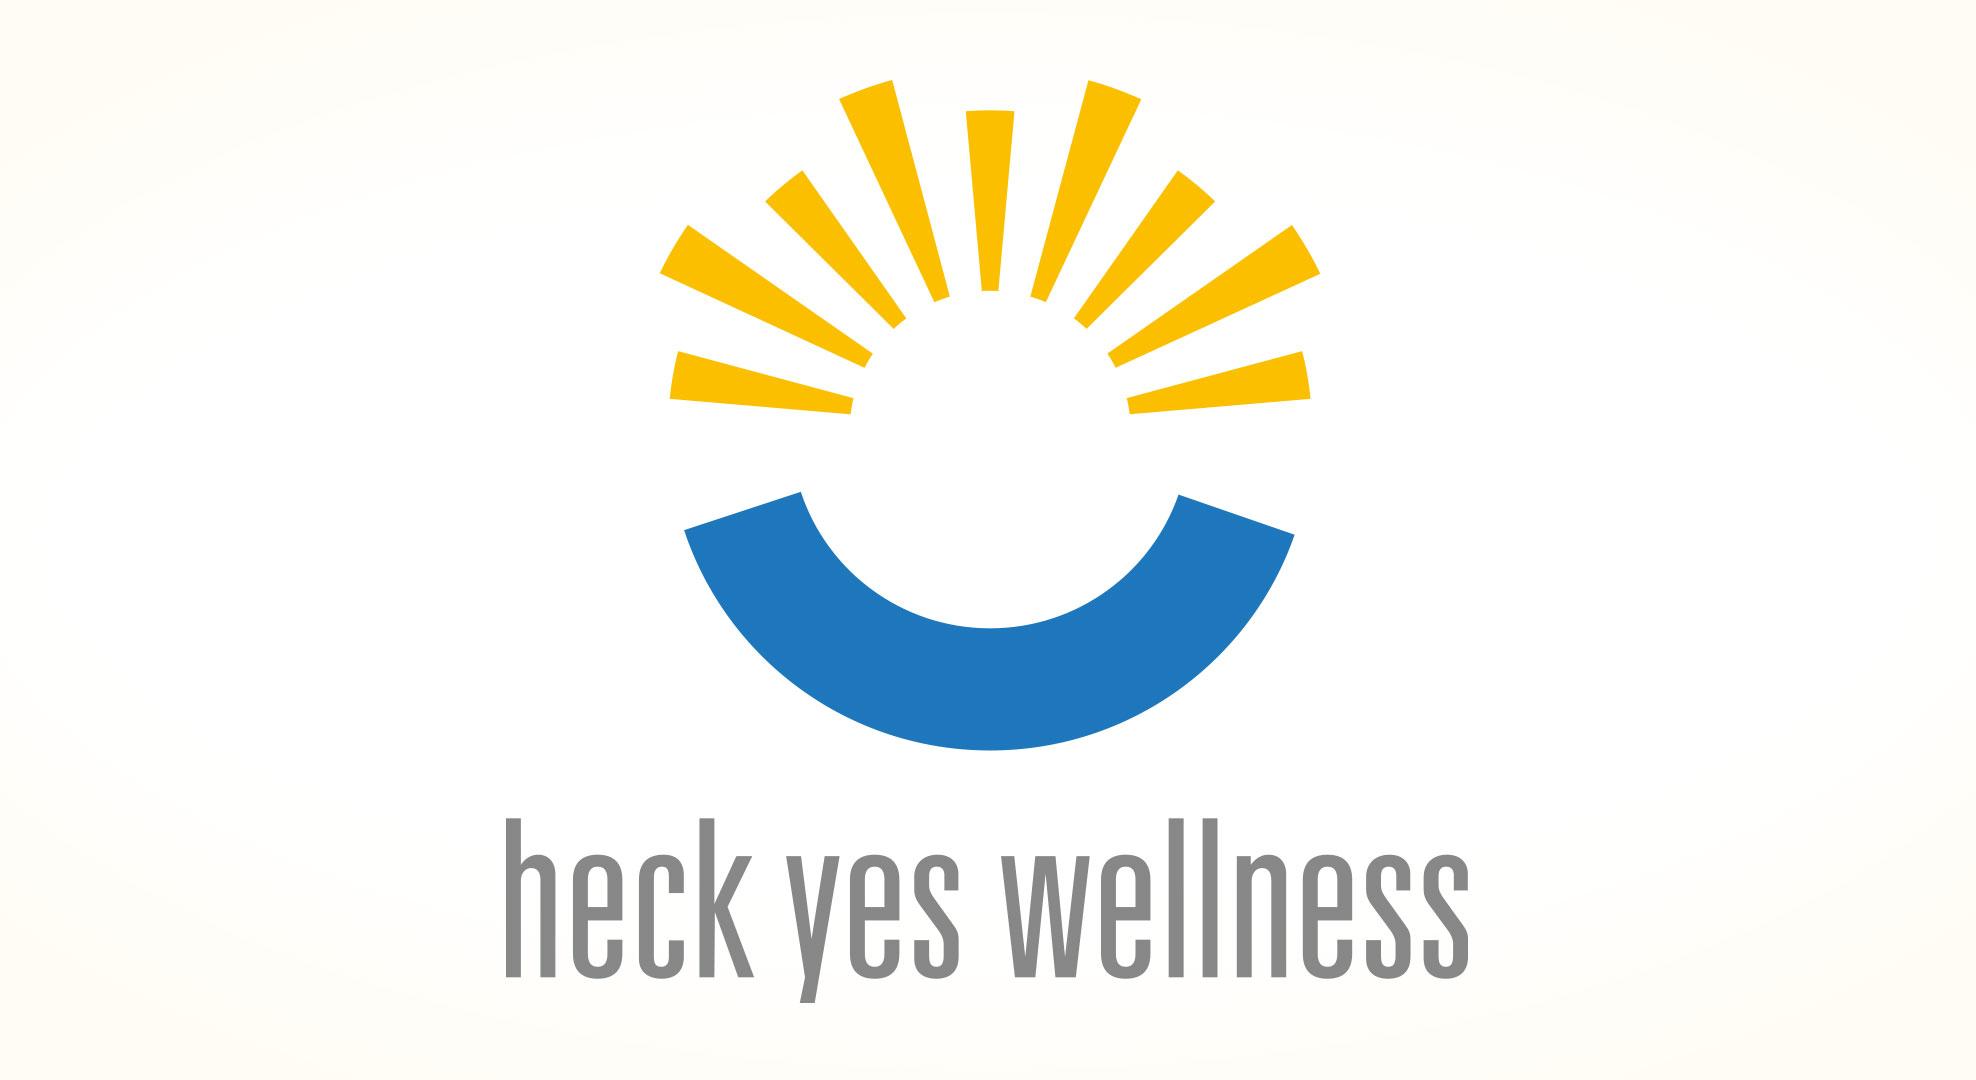 Heck Yes Wellness